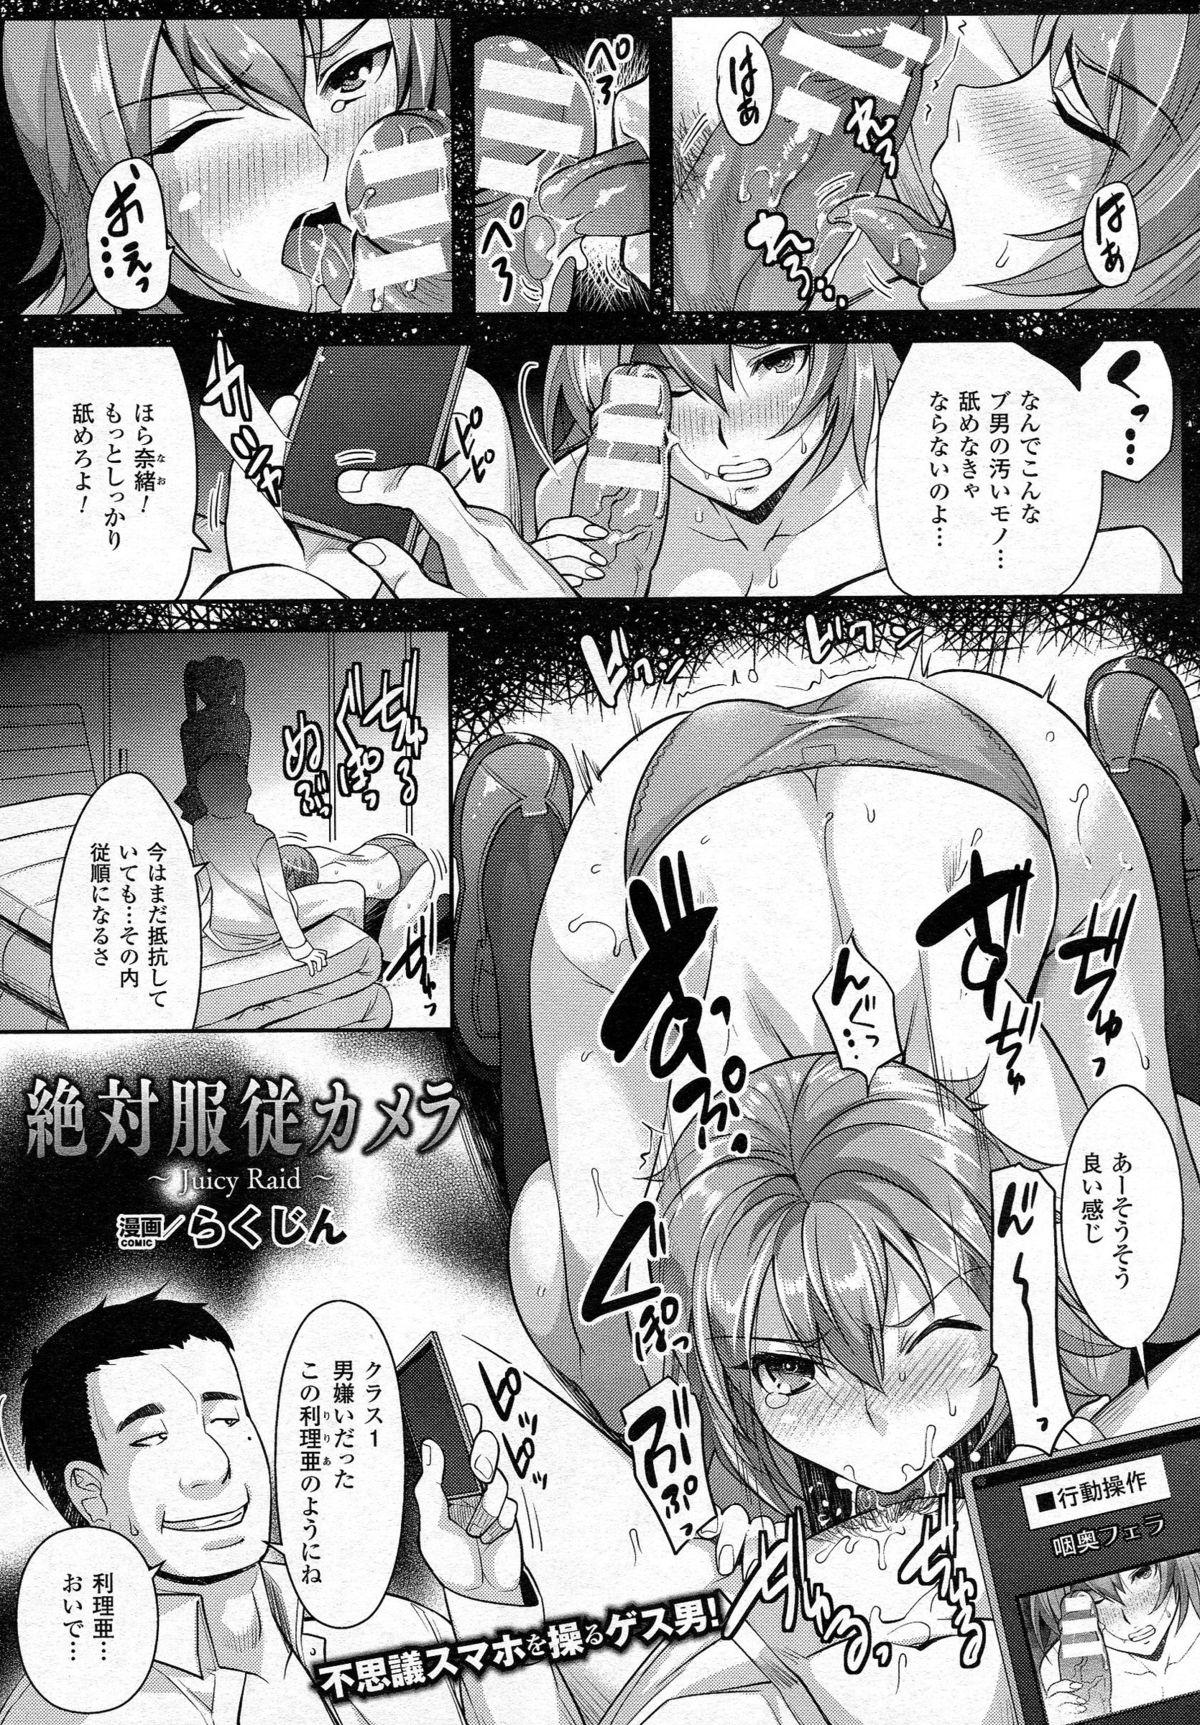 COMIC Unreal 2015-06 Vol. 55 + Hisasi Illust Shuu 243